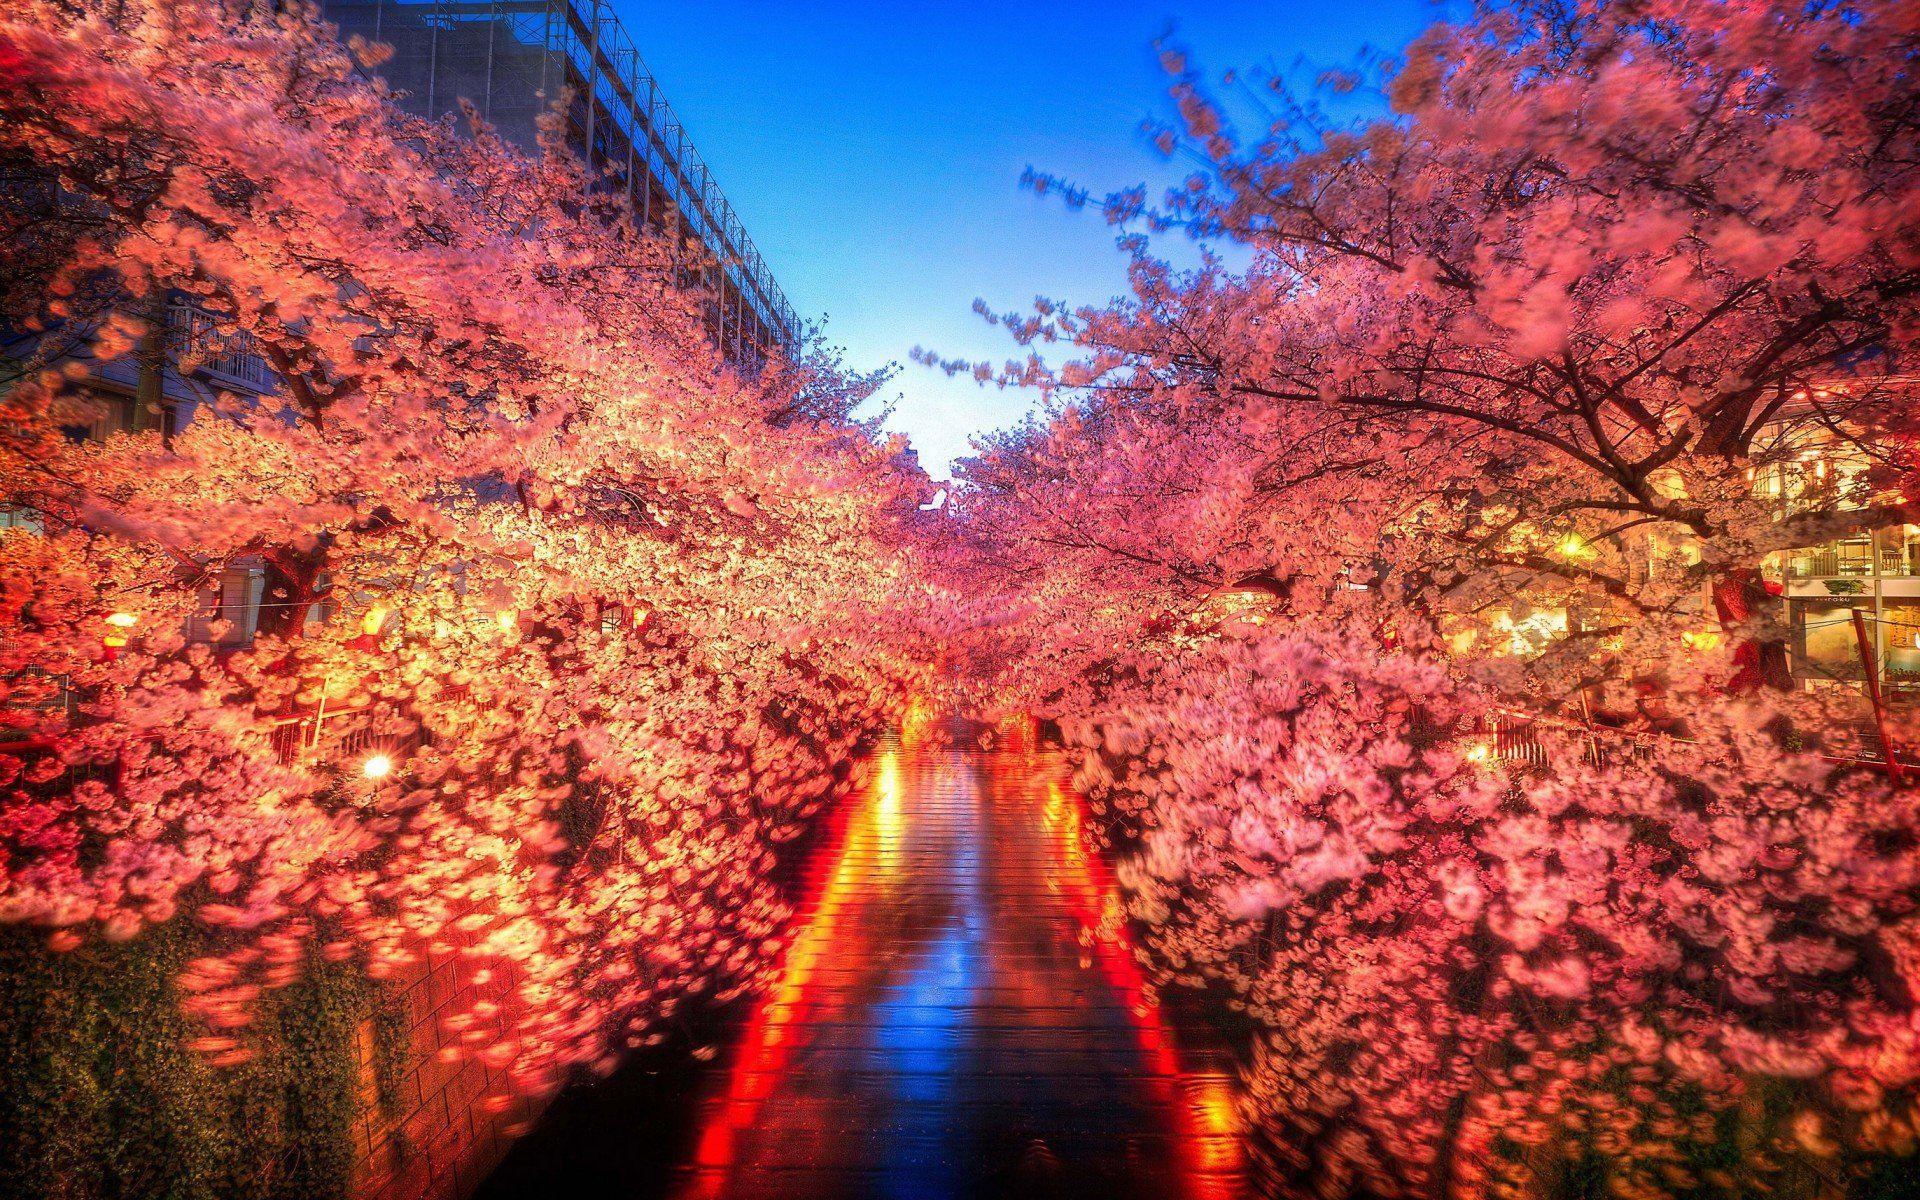 Tokyo Japan 4K Wallpapers - Top Free Tokyo Japan 4K ...